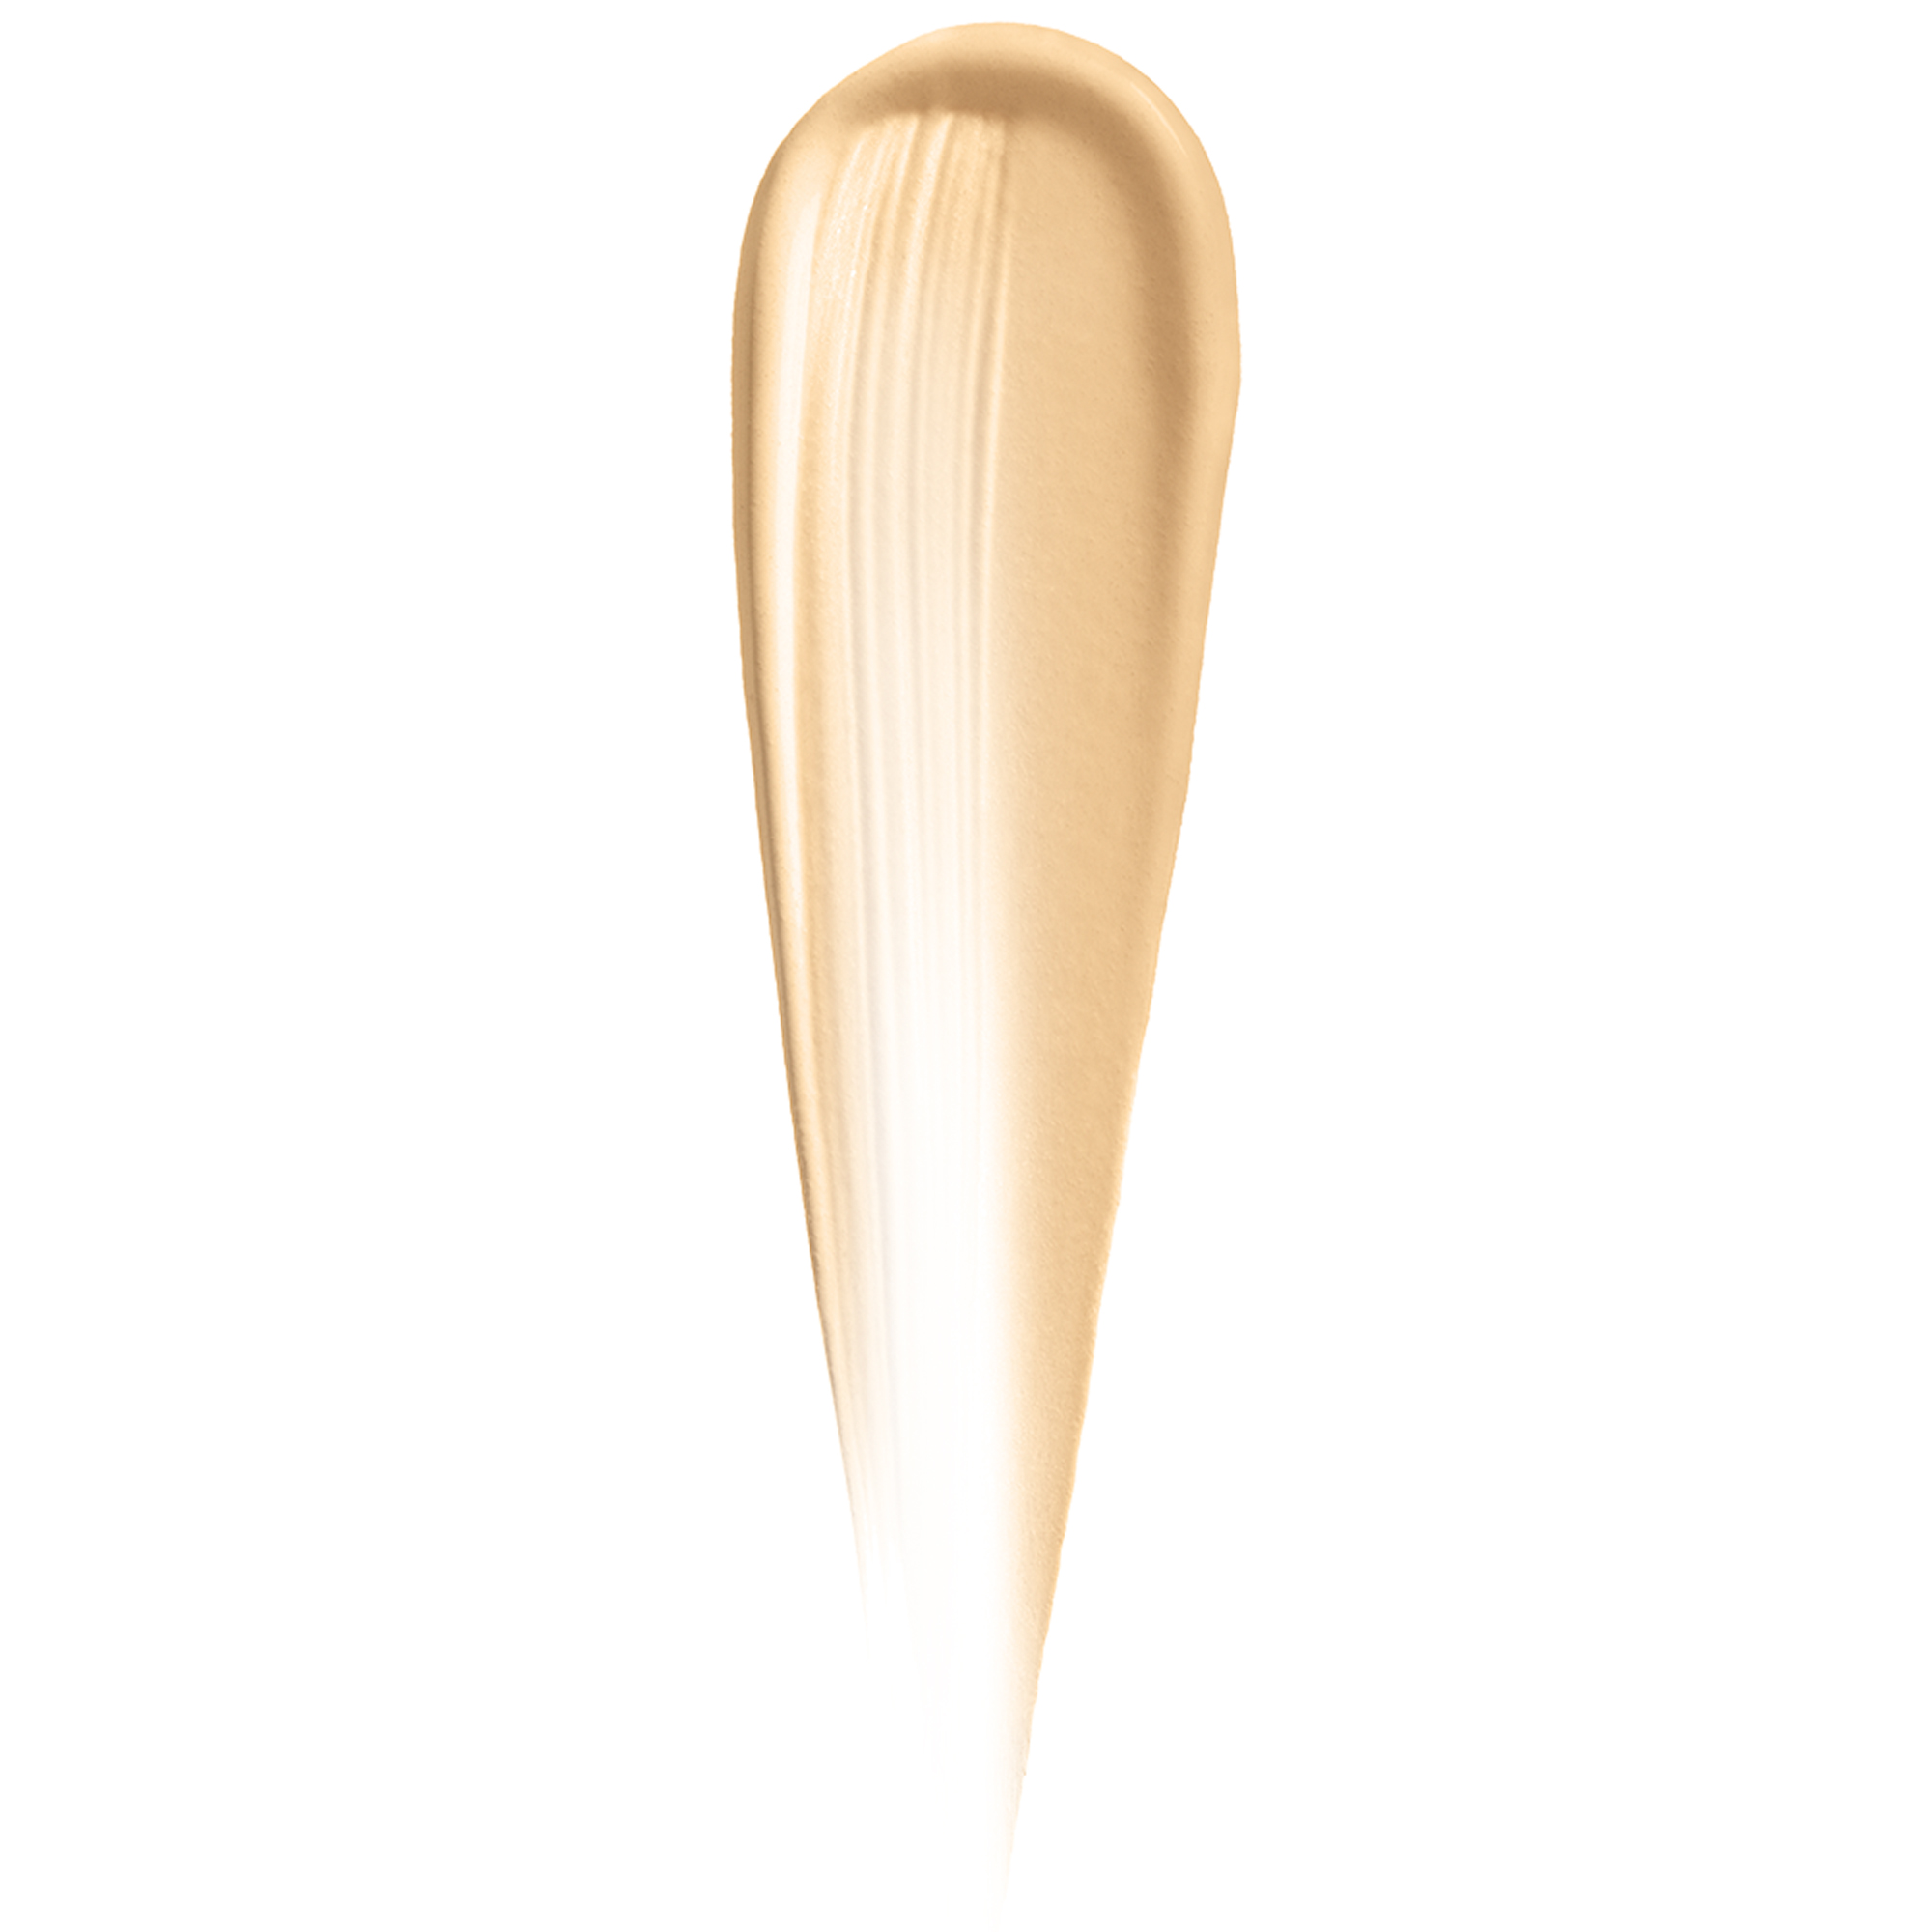 Bamboo 5.5